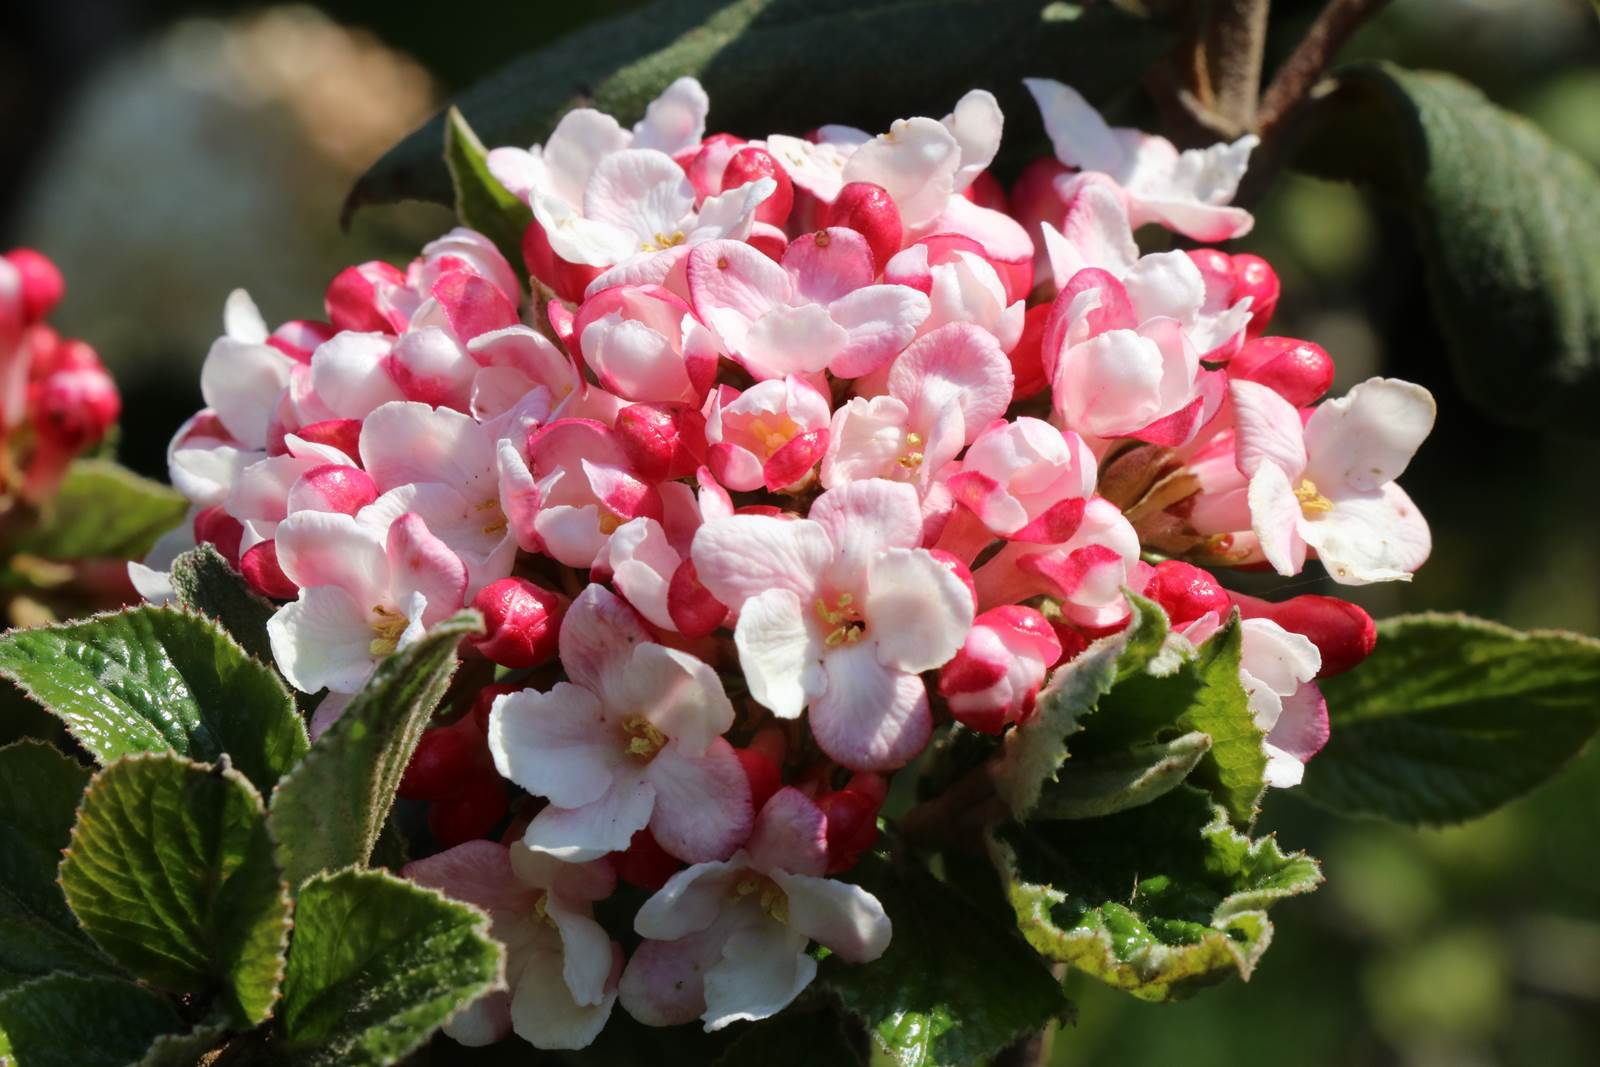 Viburnum x burkwoodii Mohawk